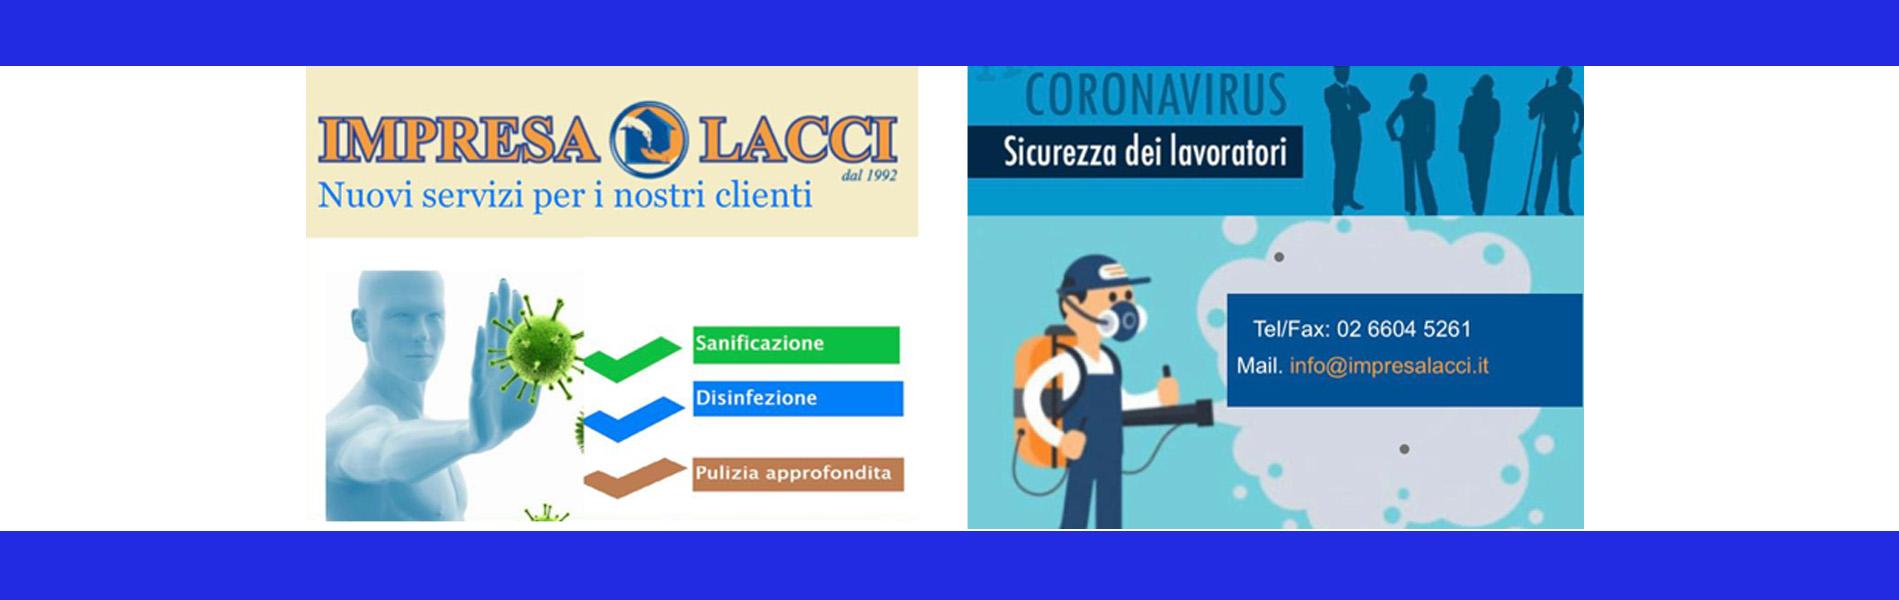 Clienti Per Imprese Edili impresa lacci home - impresa lacci